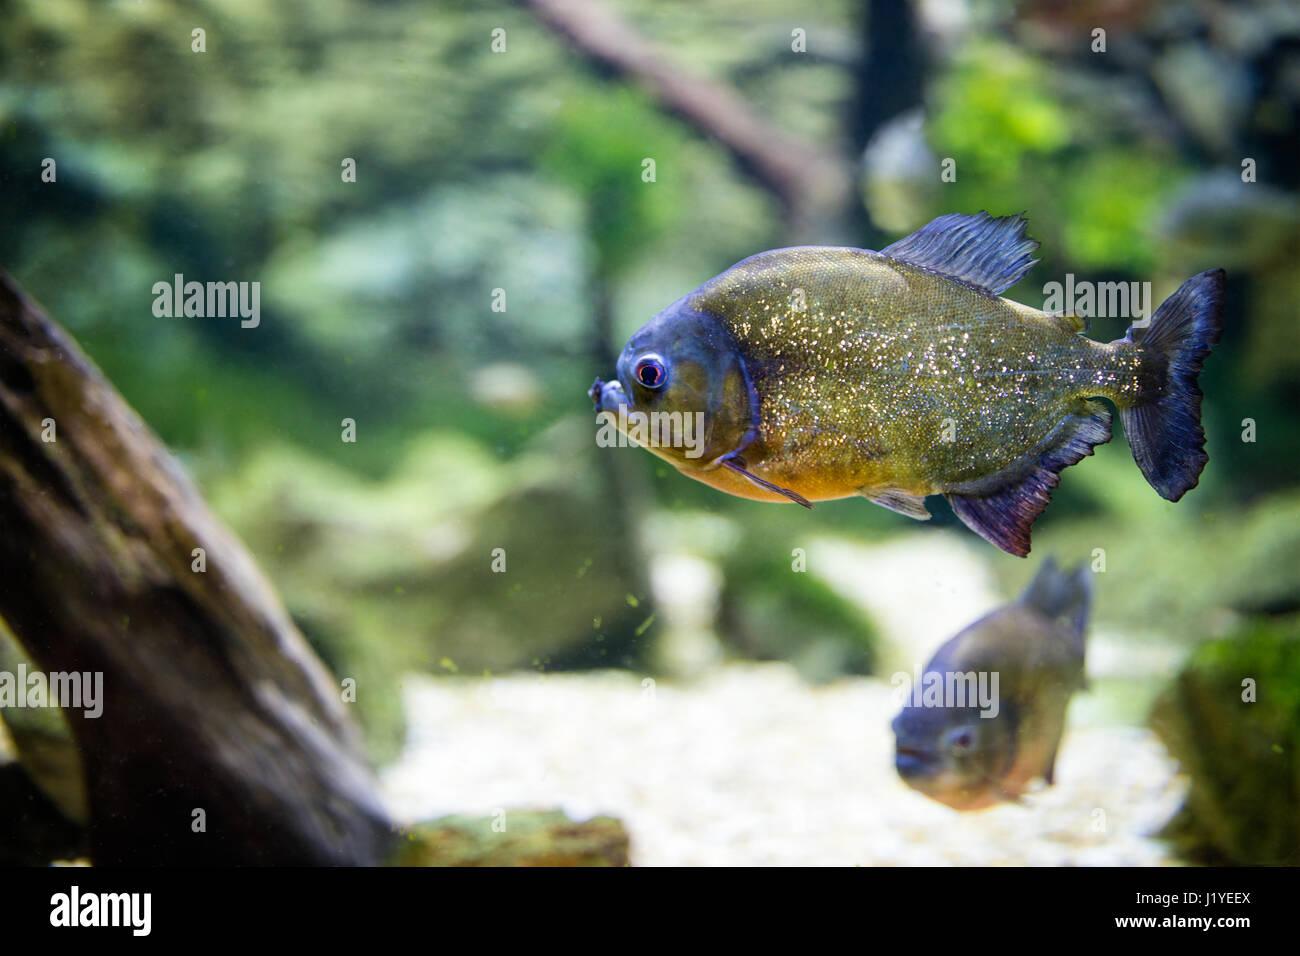 Freshwater aquarium fish piranha - Stock Photo Tropical Piranha Fish In Freshwater Aquarium